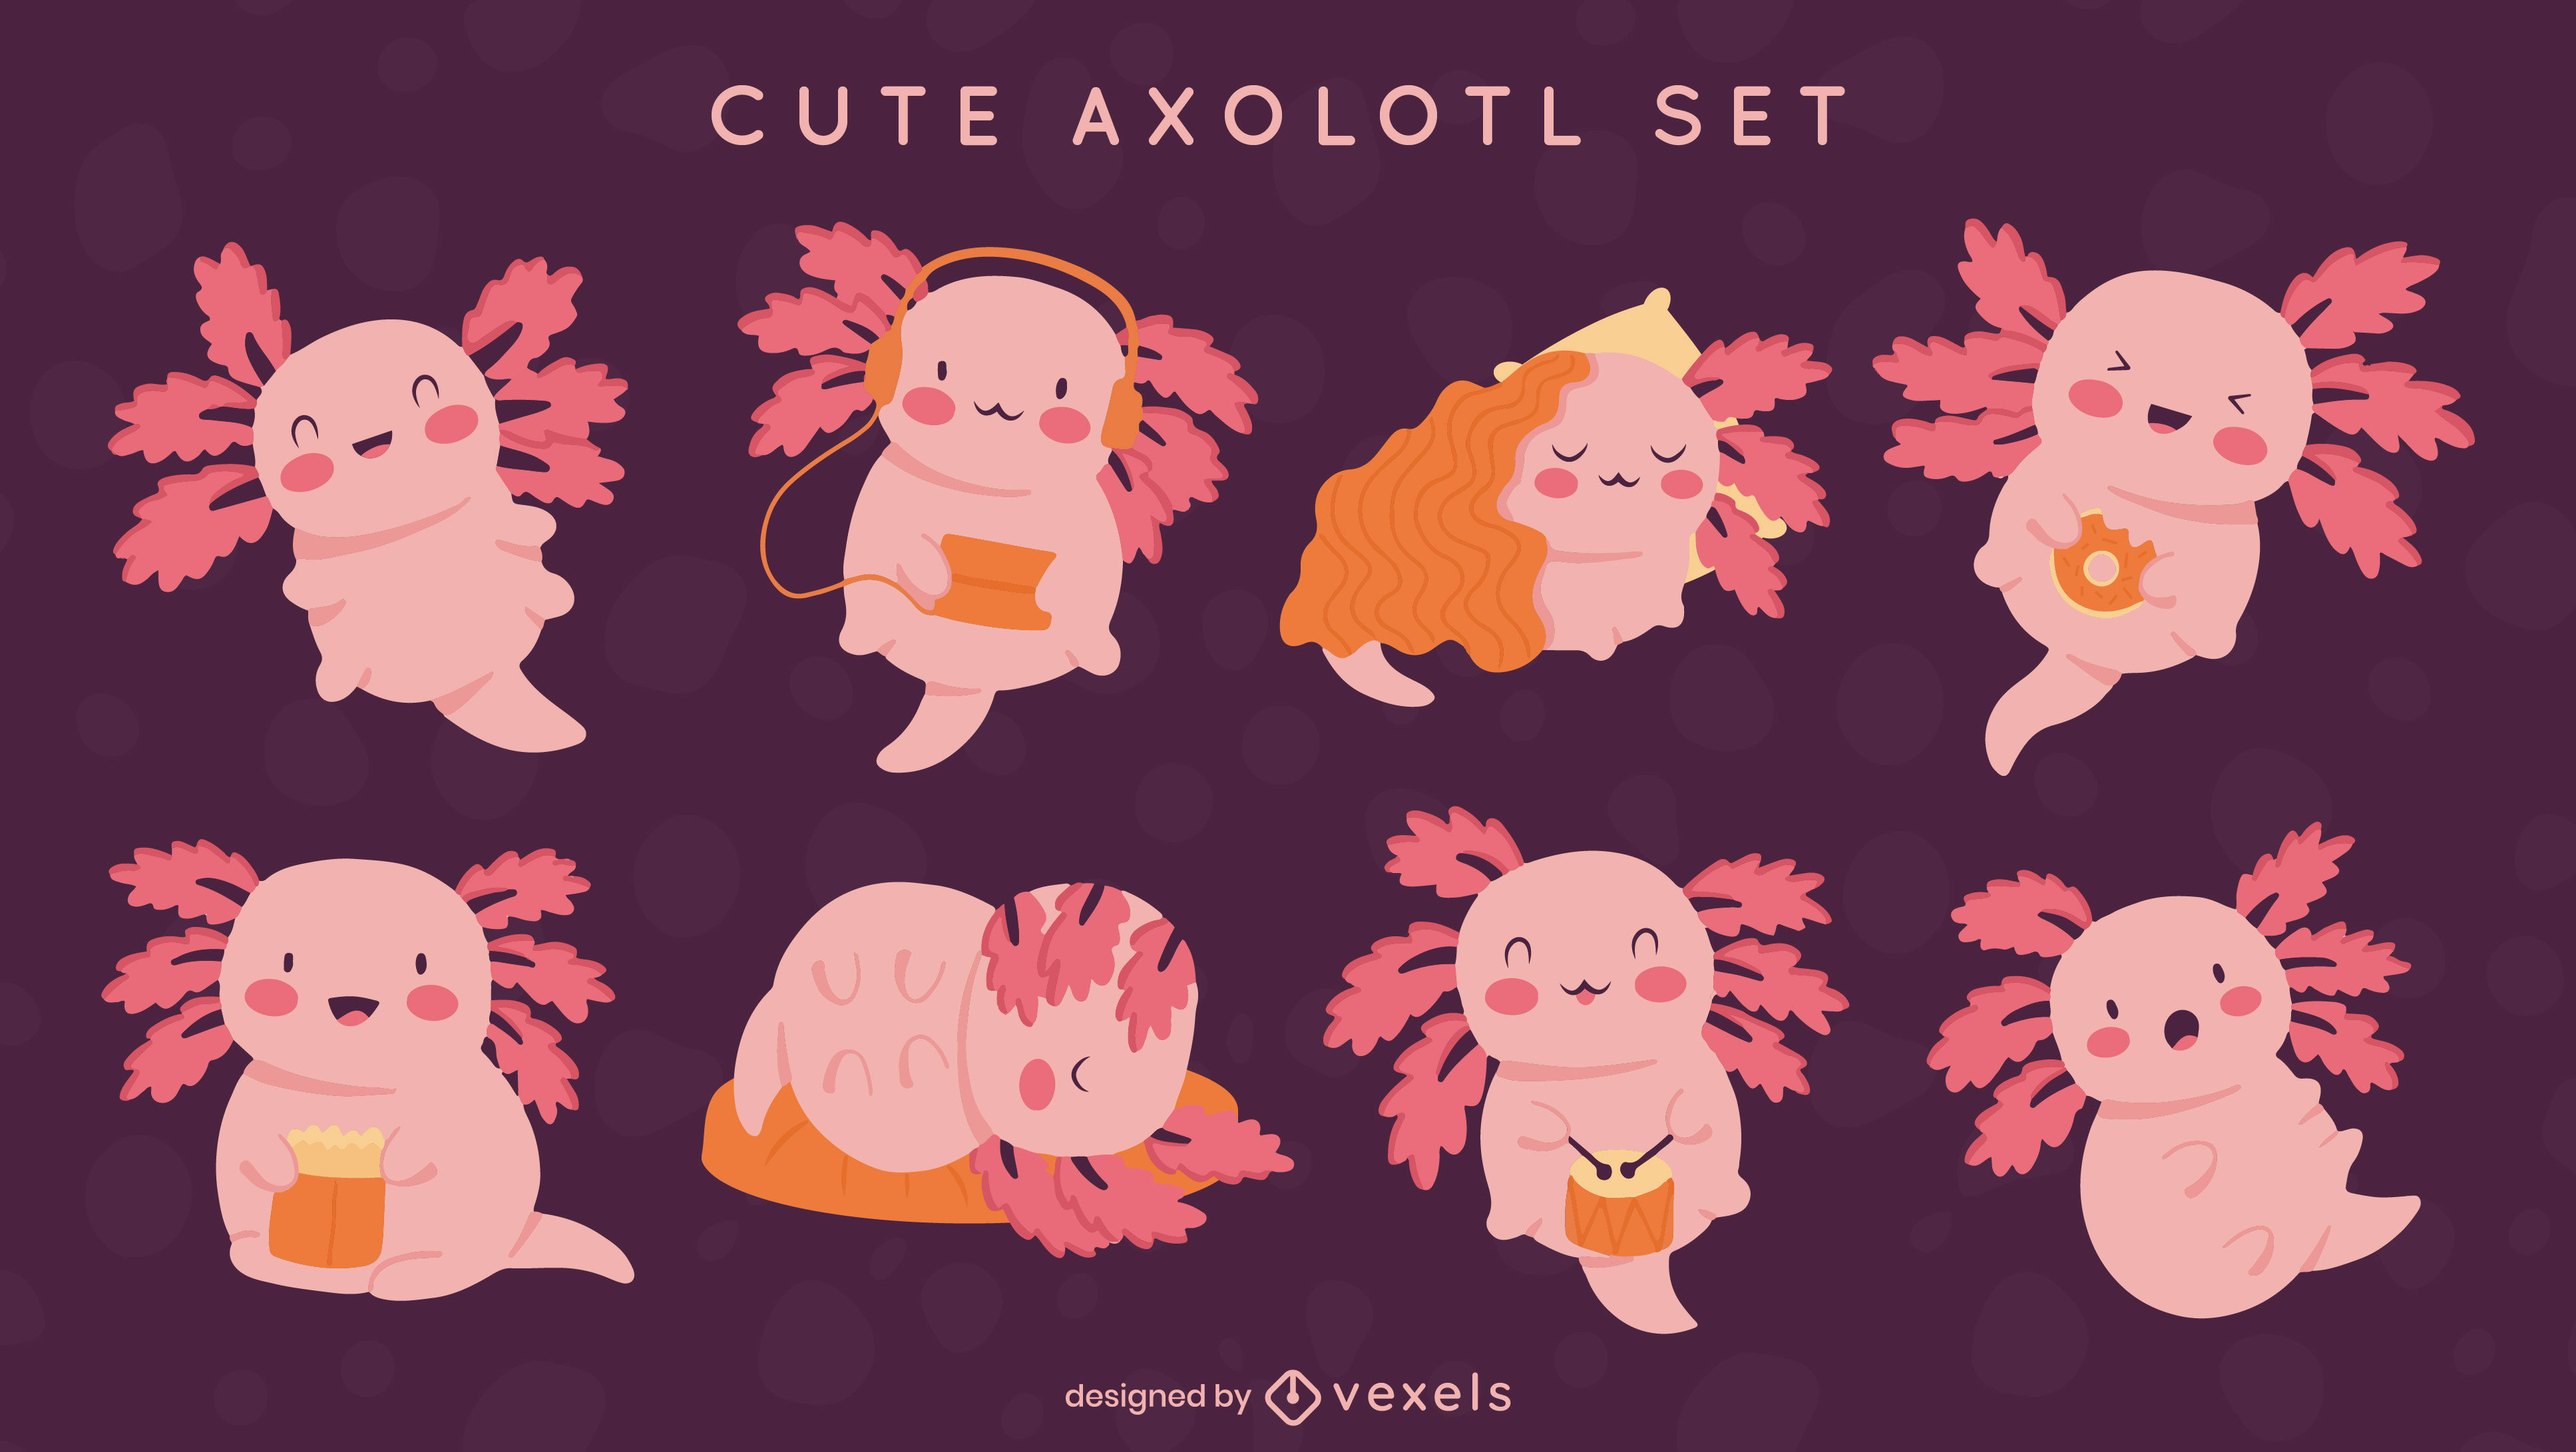 Adorable conjunto de caracteres de animales axolotl